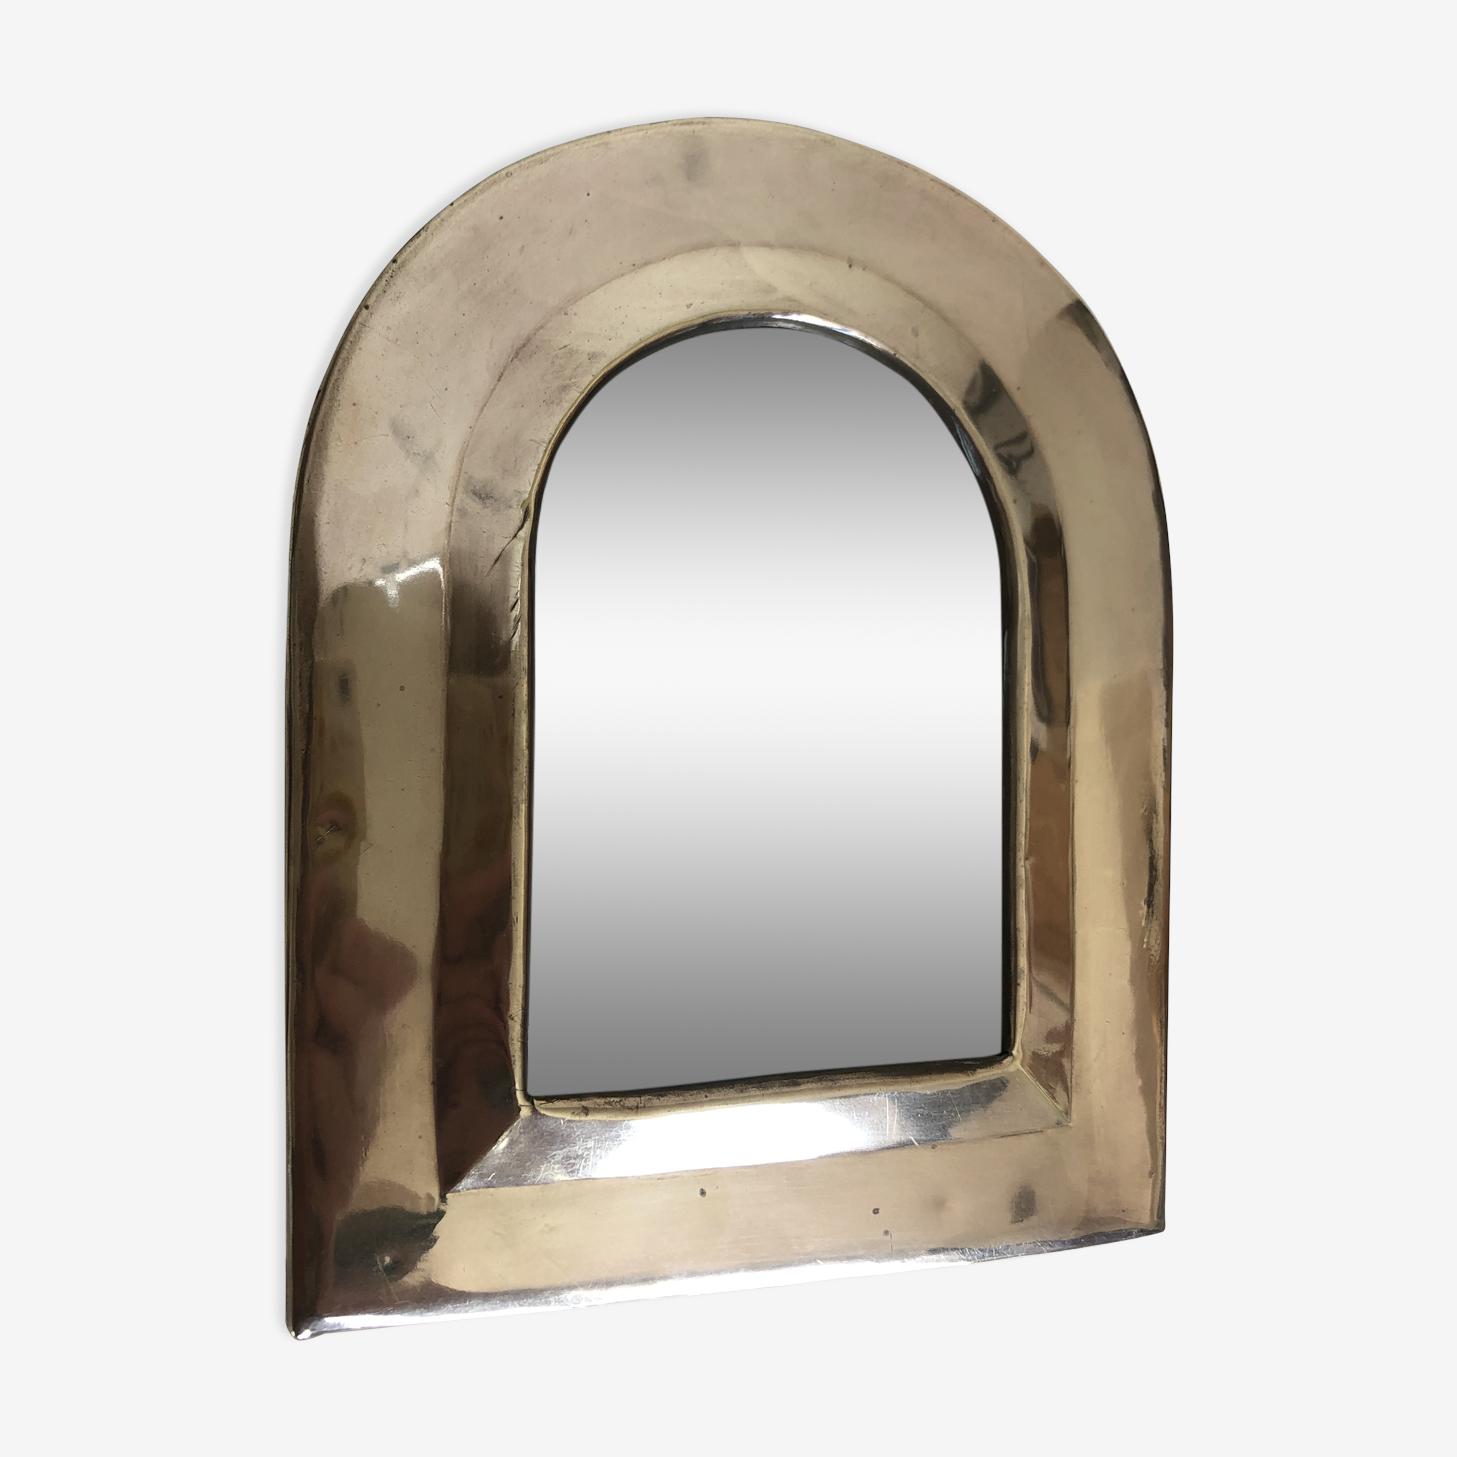 Miroir en laiton 21,5 x 17,5 cm